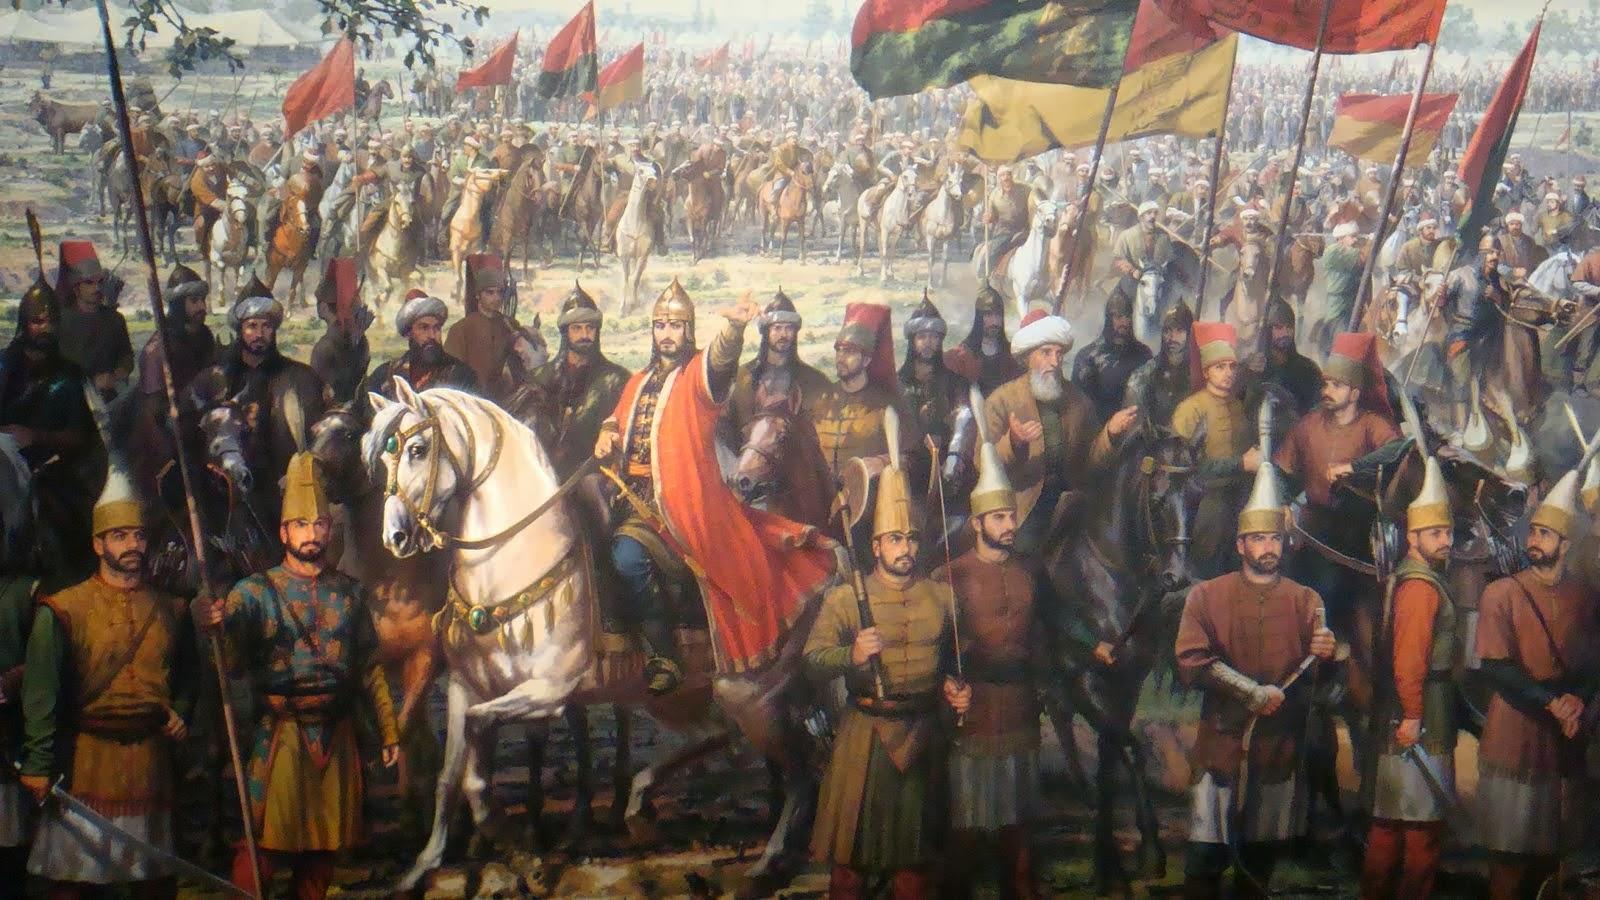 Kisah Kekuatan Islam Di Turki Dan Kebangkitannya